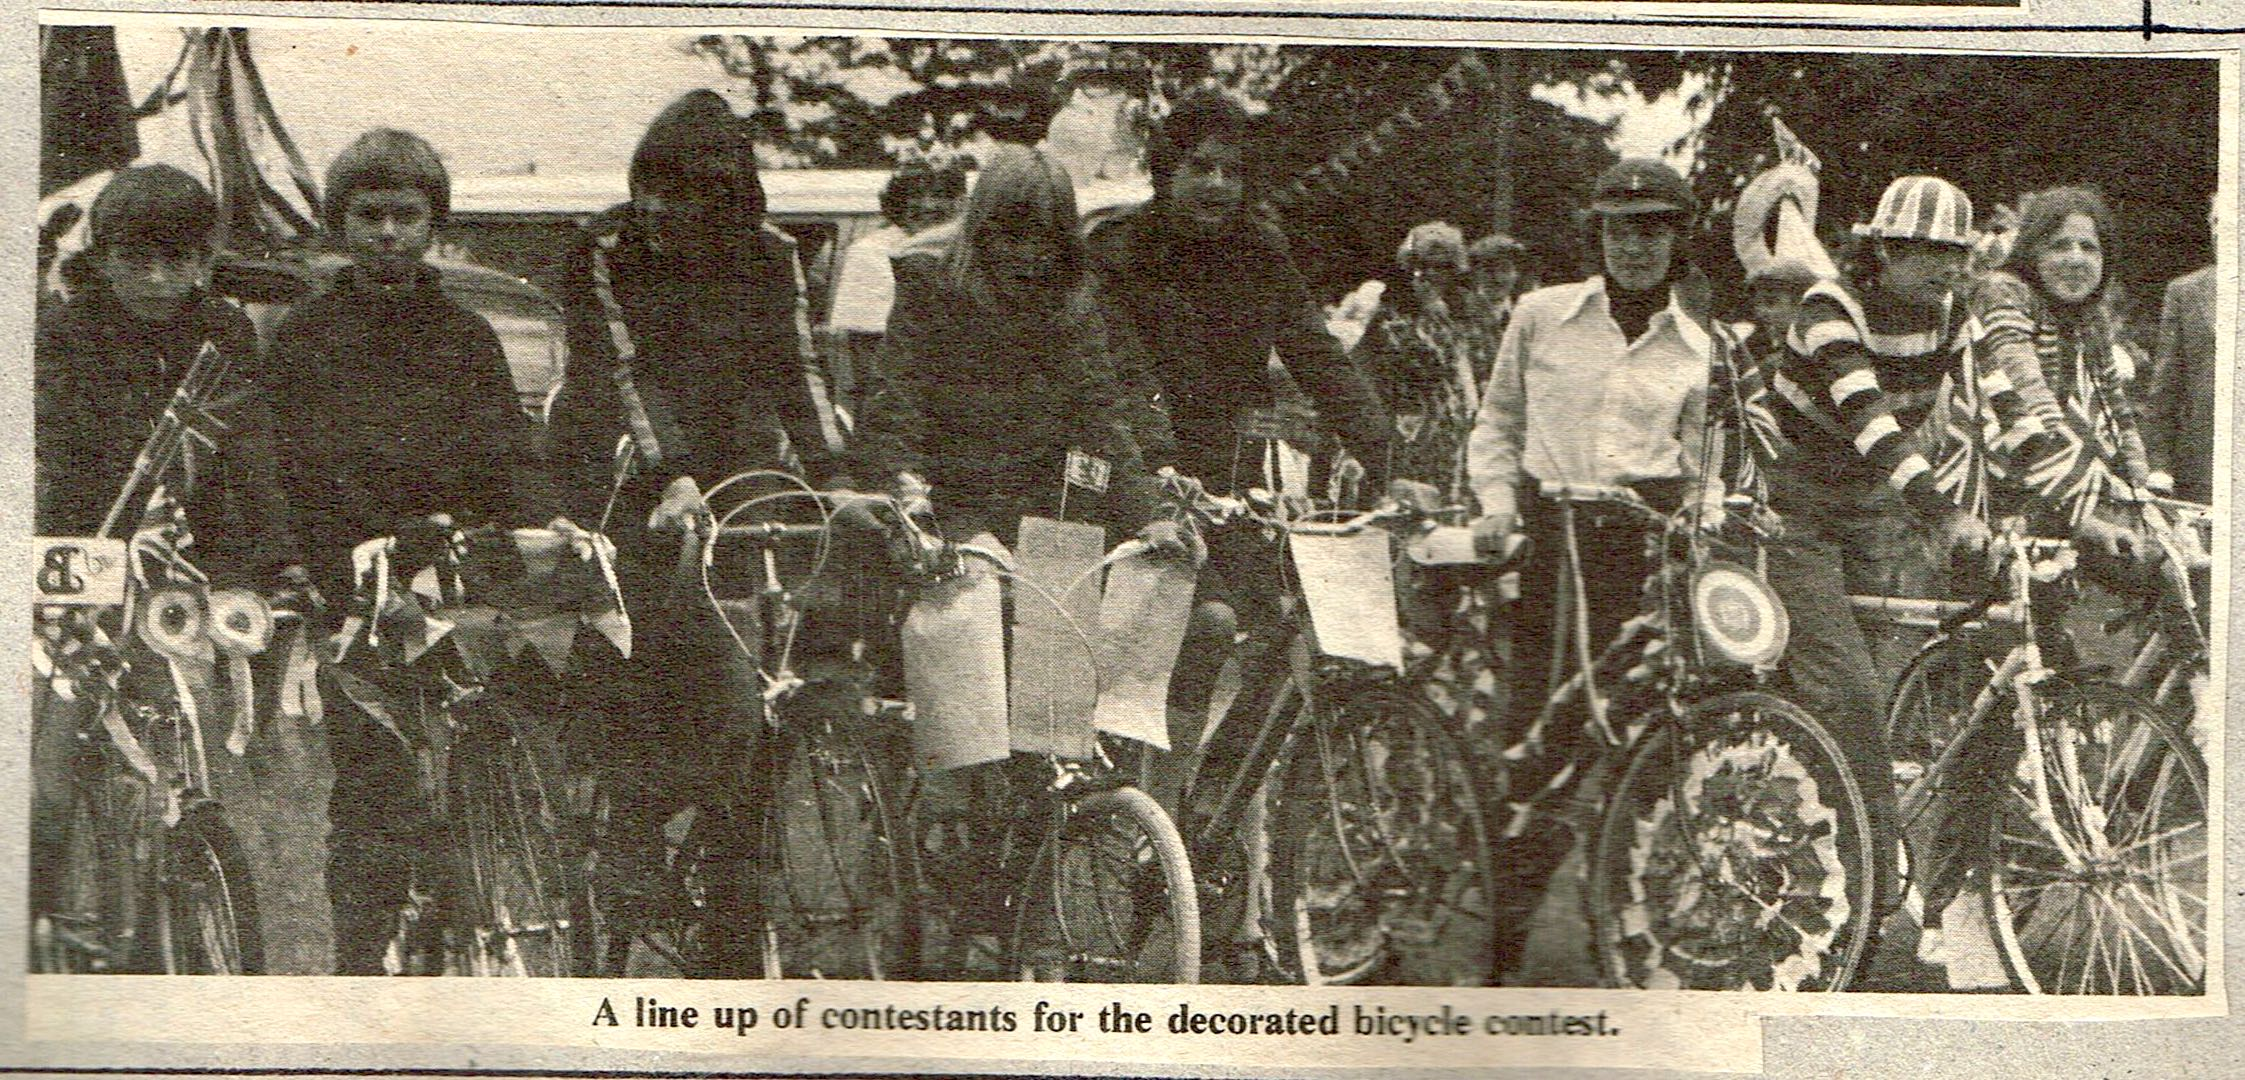 1977 Decorated Bikes.jpg